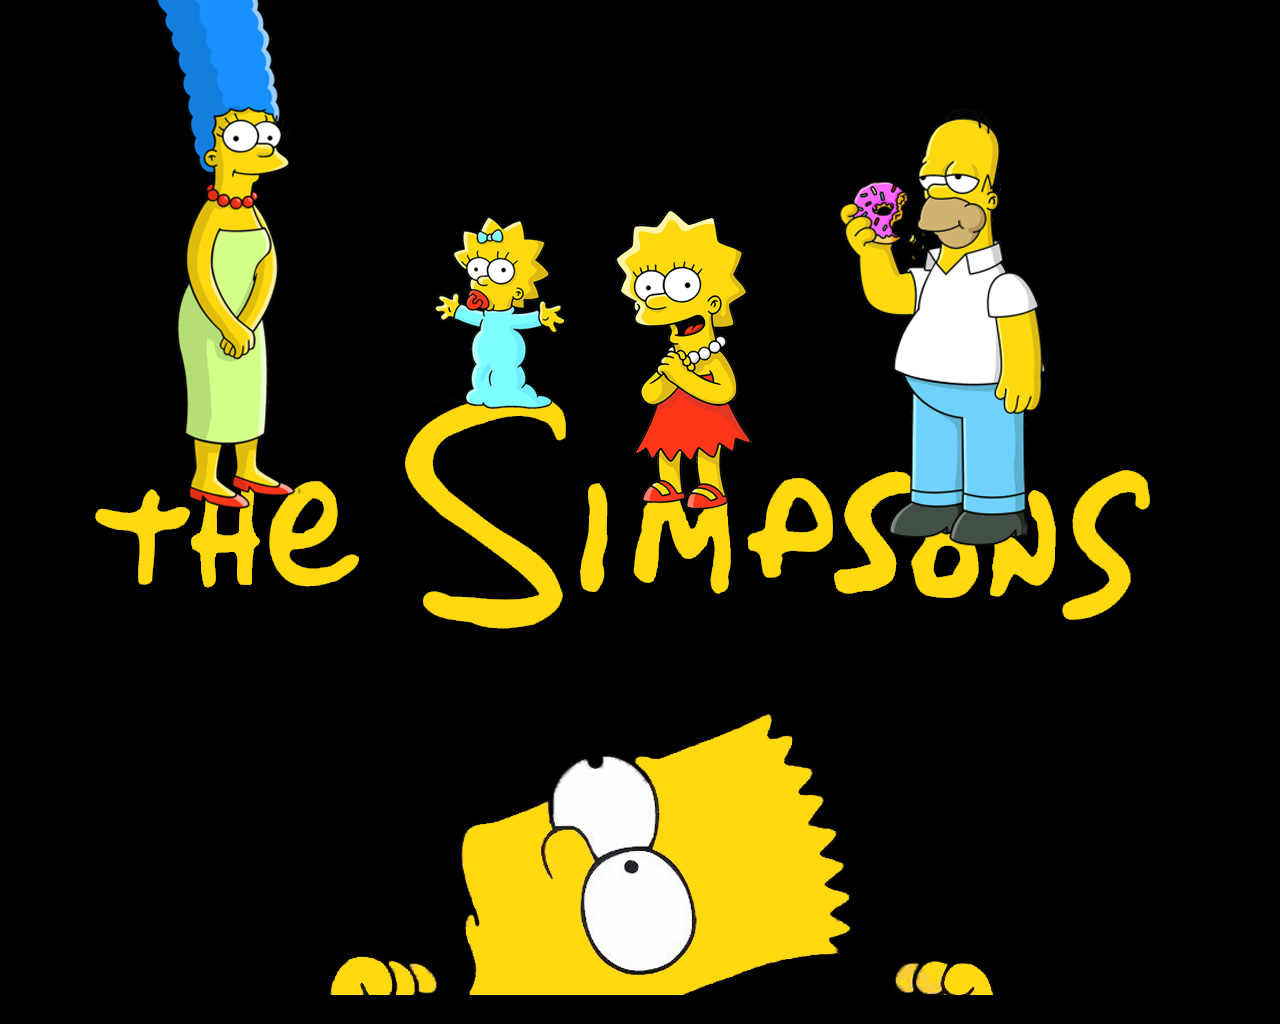 Windows Vista Wallpaper Simpsons Wallpaper 1280x1024